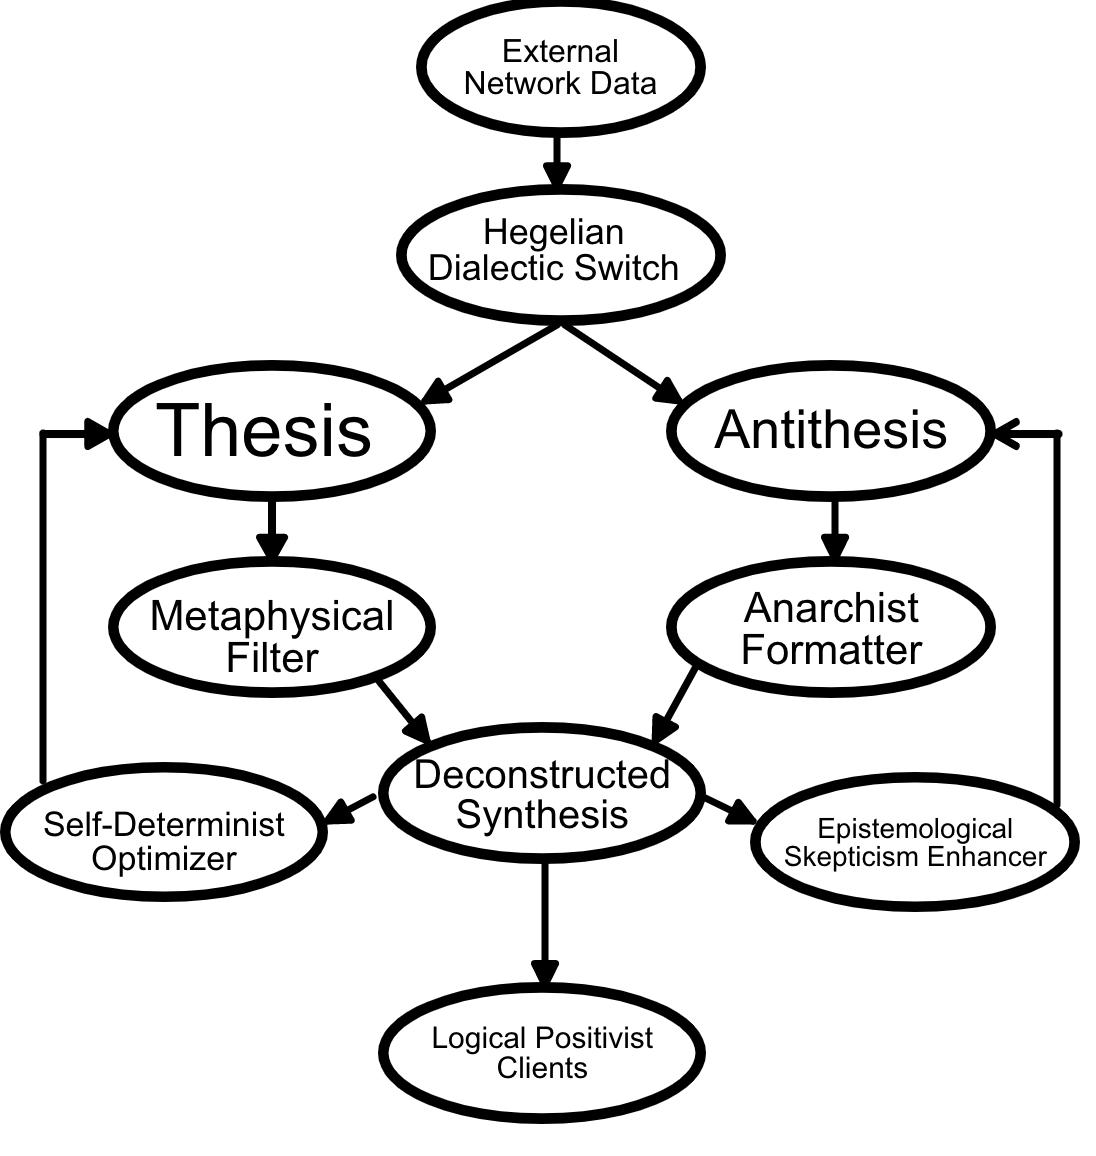 Figure 1: Nihilistic Network Management Model architecture